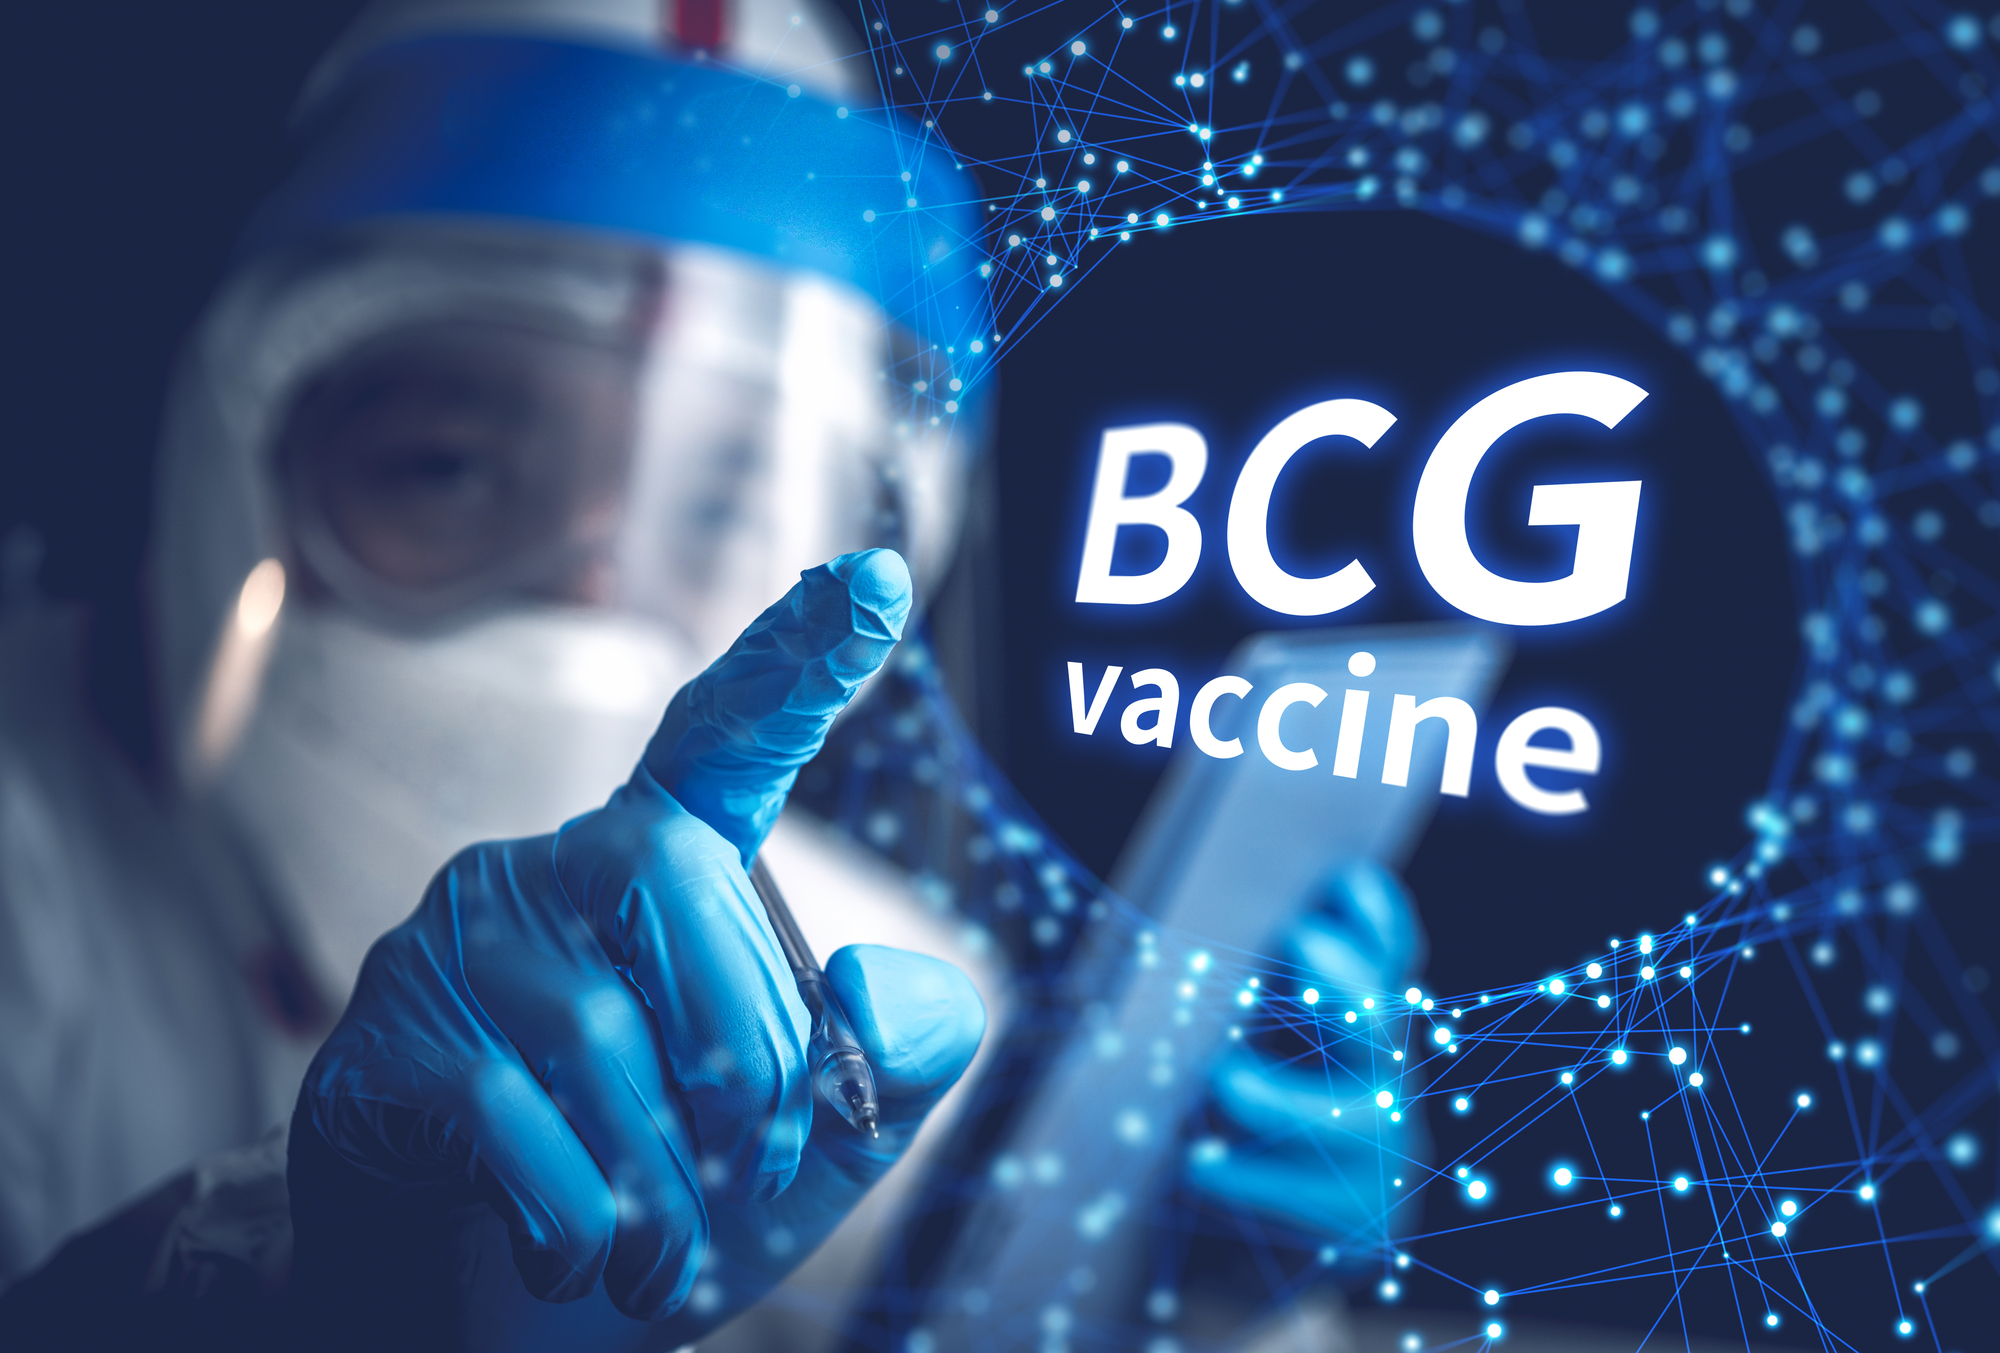 Bcg 接種 予防 コロナ 新型